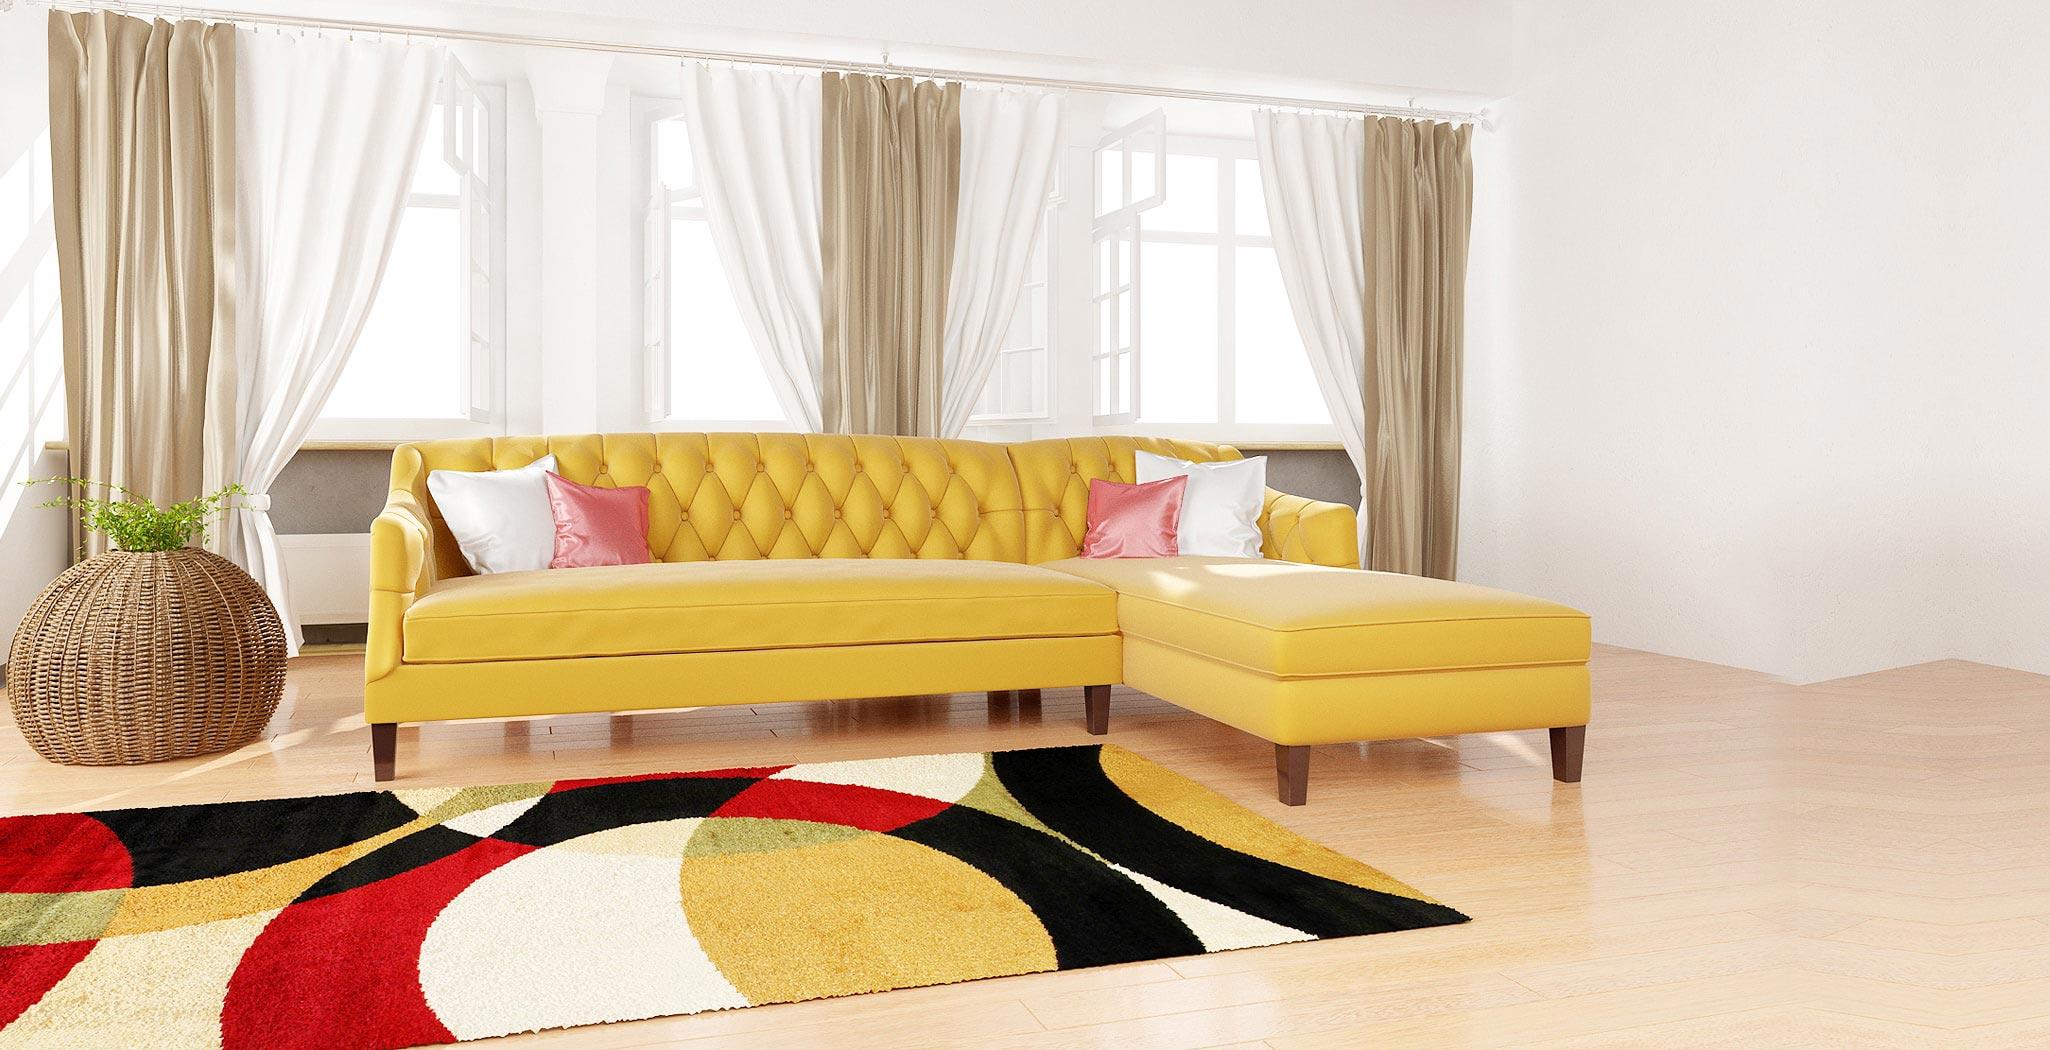 shiraz panel furniture gallery 5